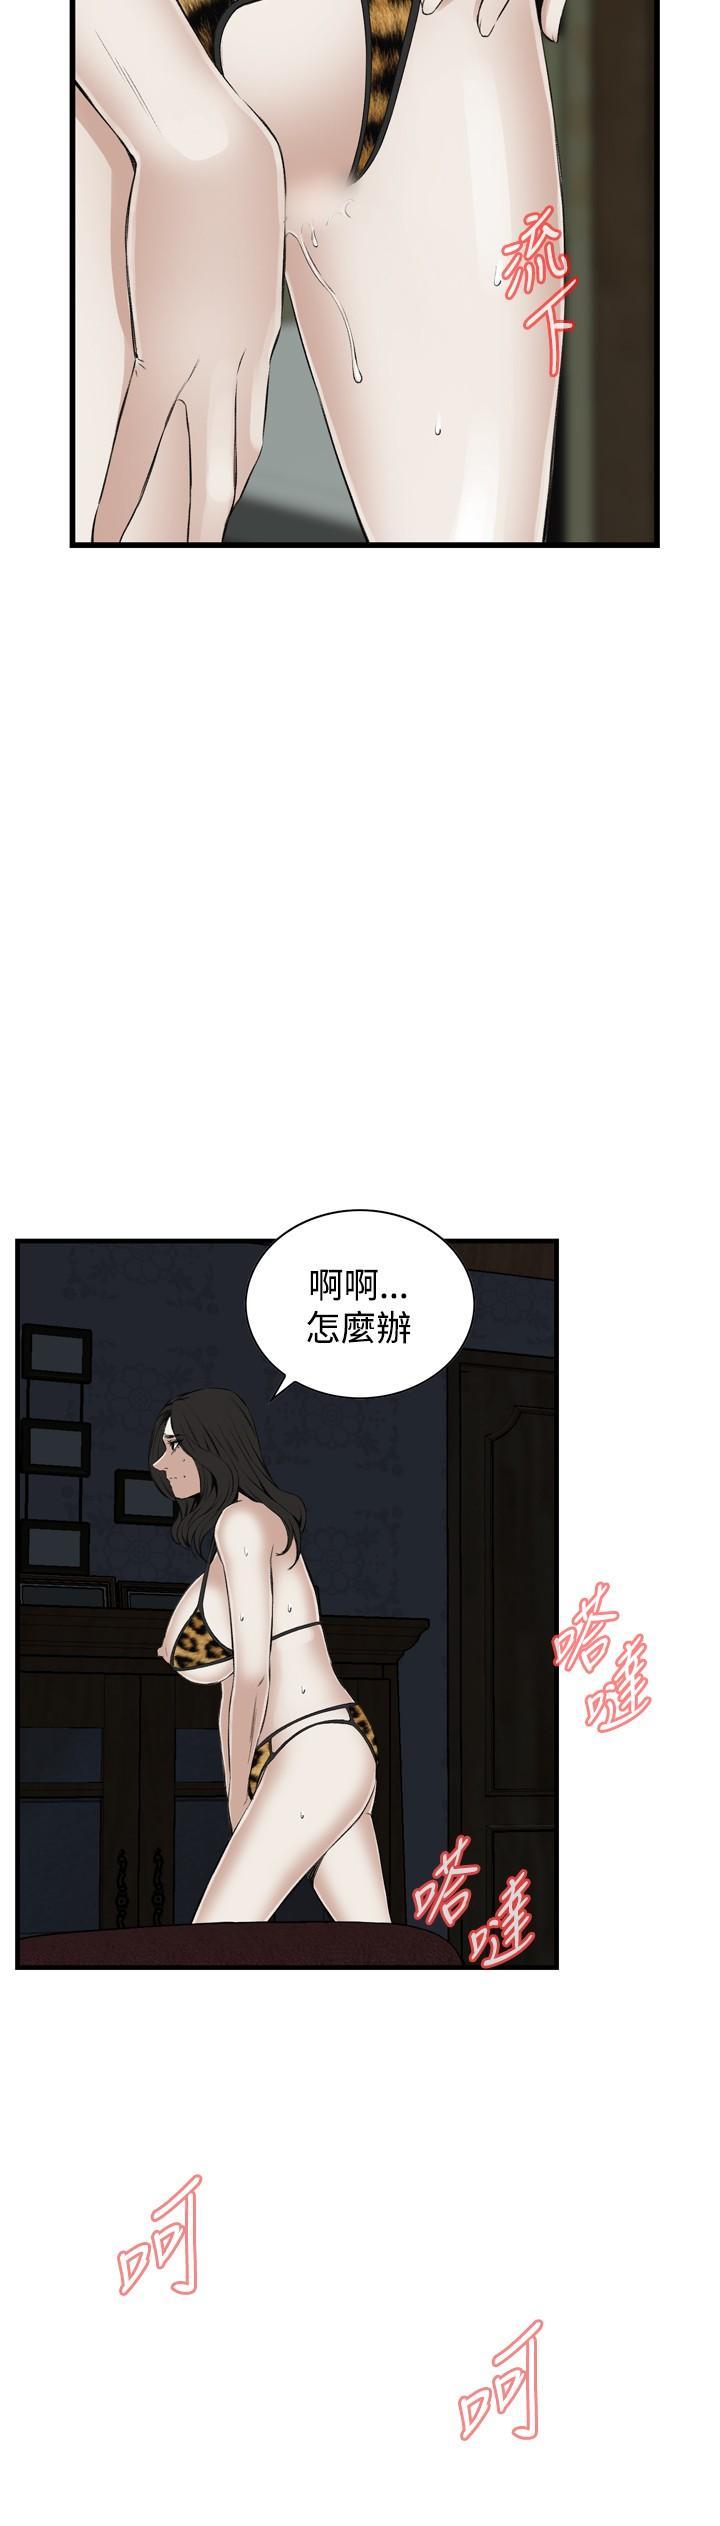 Take a Peek 偷窥 Ch.39~55 [Chinese]中文 480